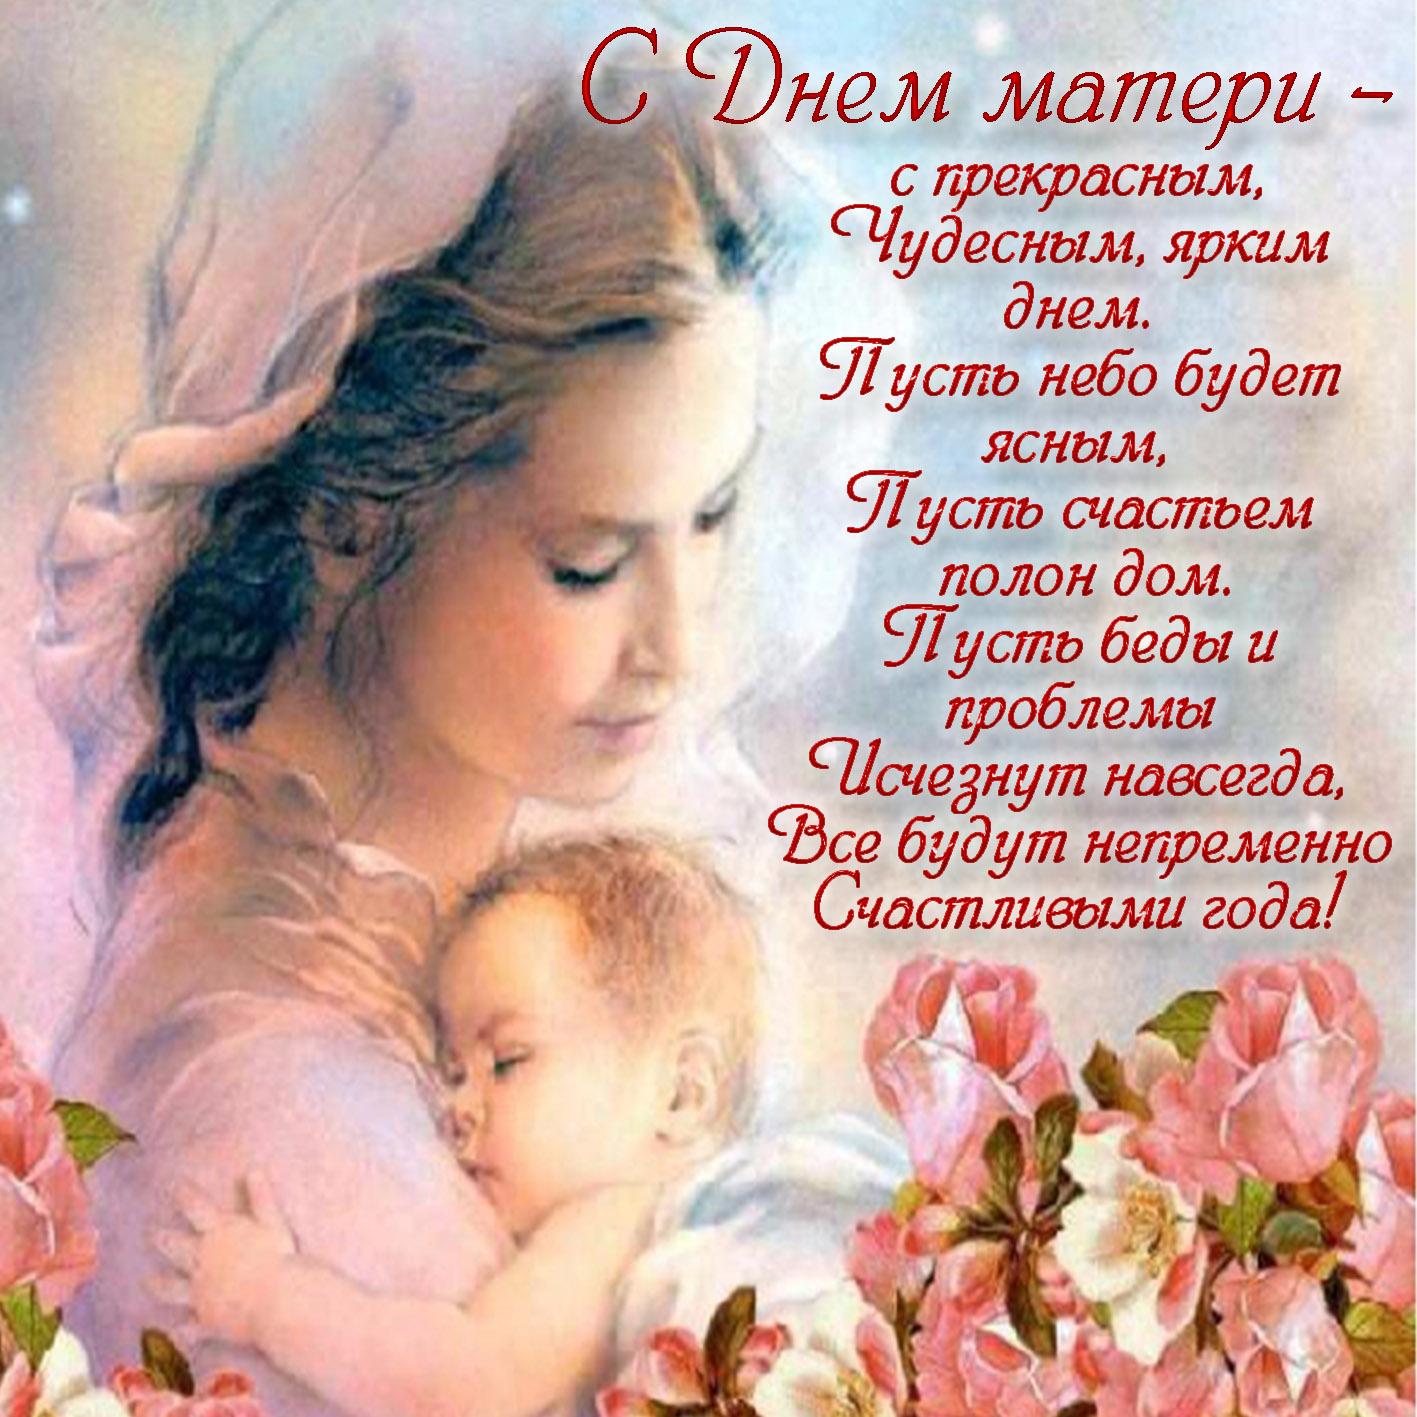 Название открыток к дню матери, картинки